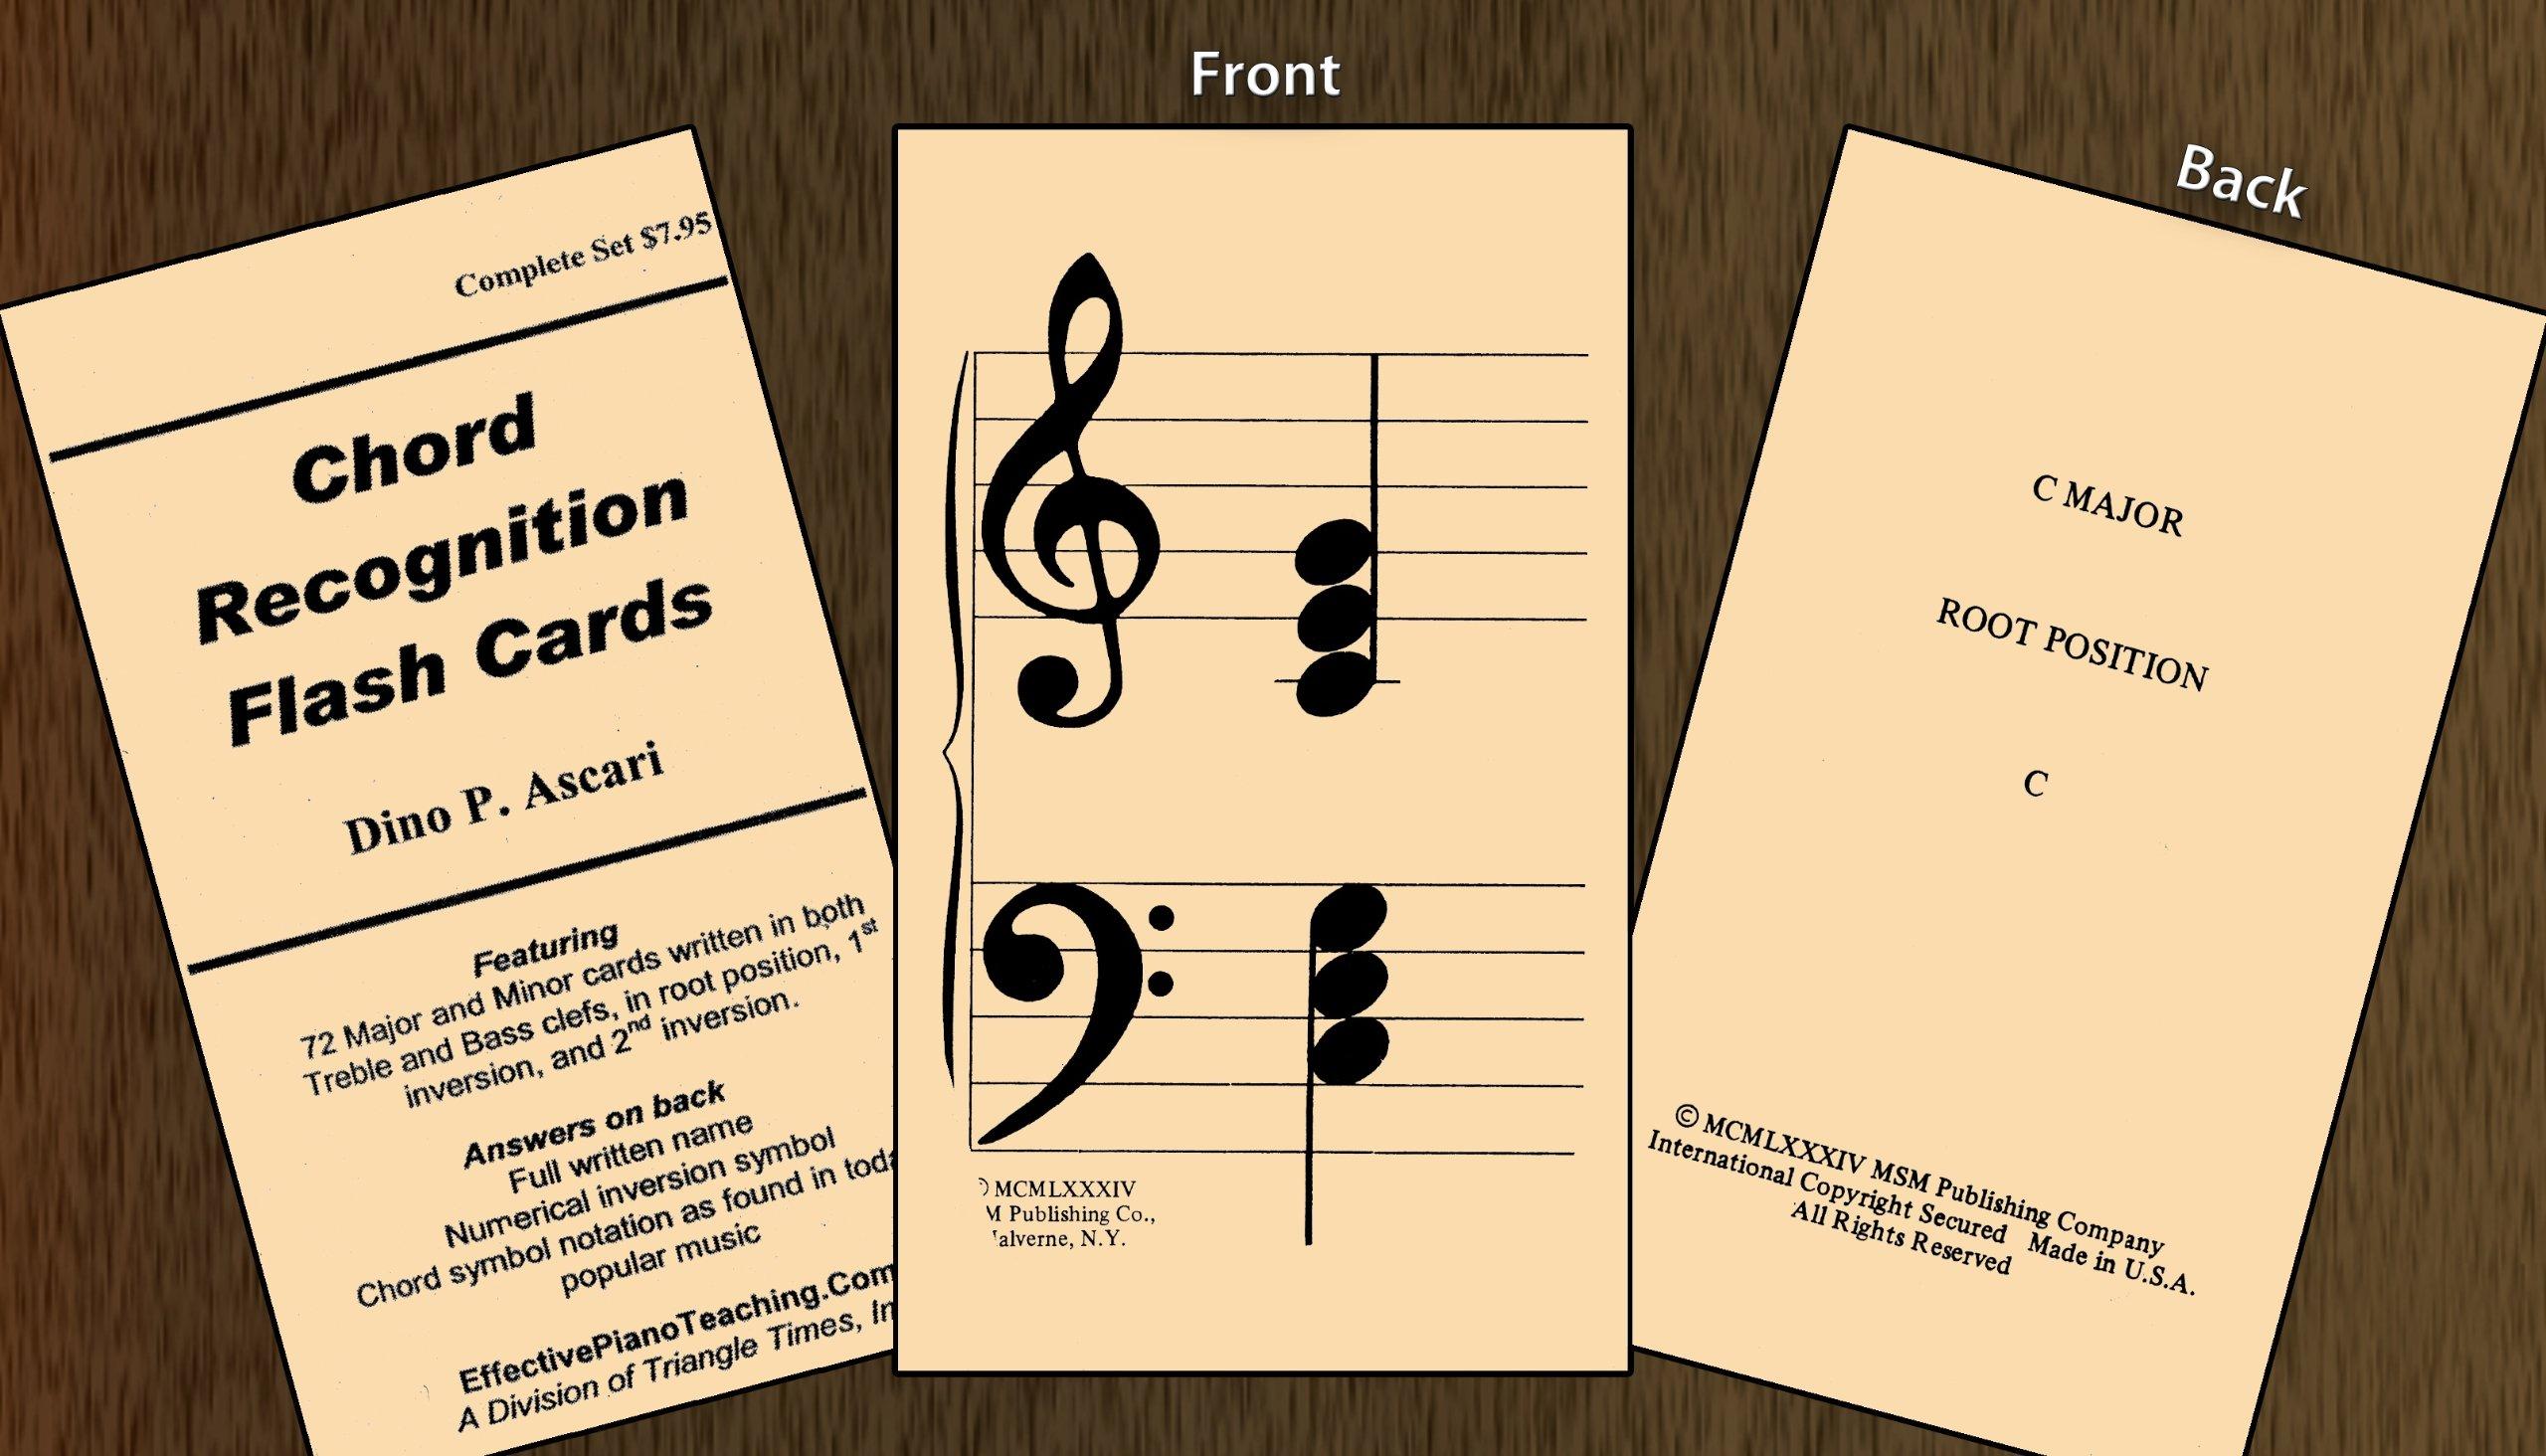 Chord Recognition Flashcards- 72 Major/Minor Cards: Dino P  Ascari